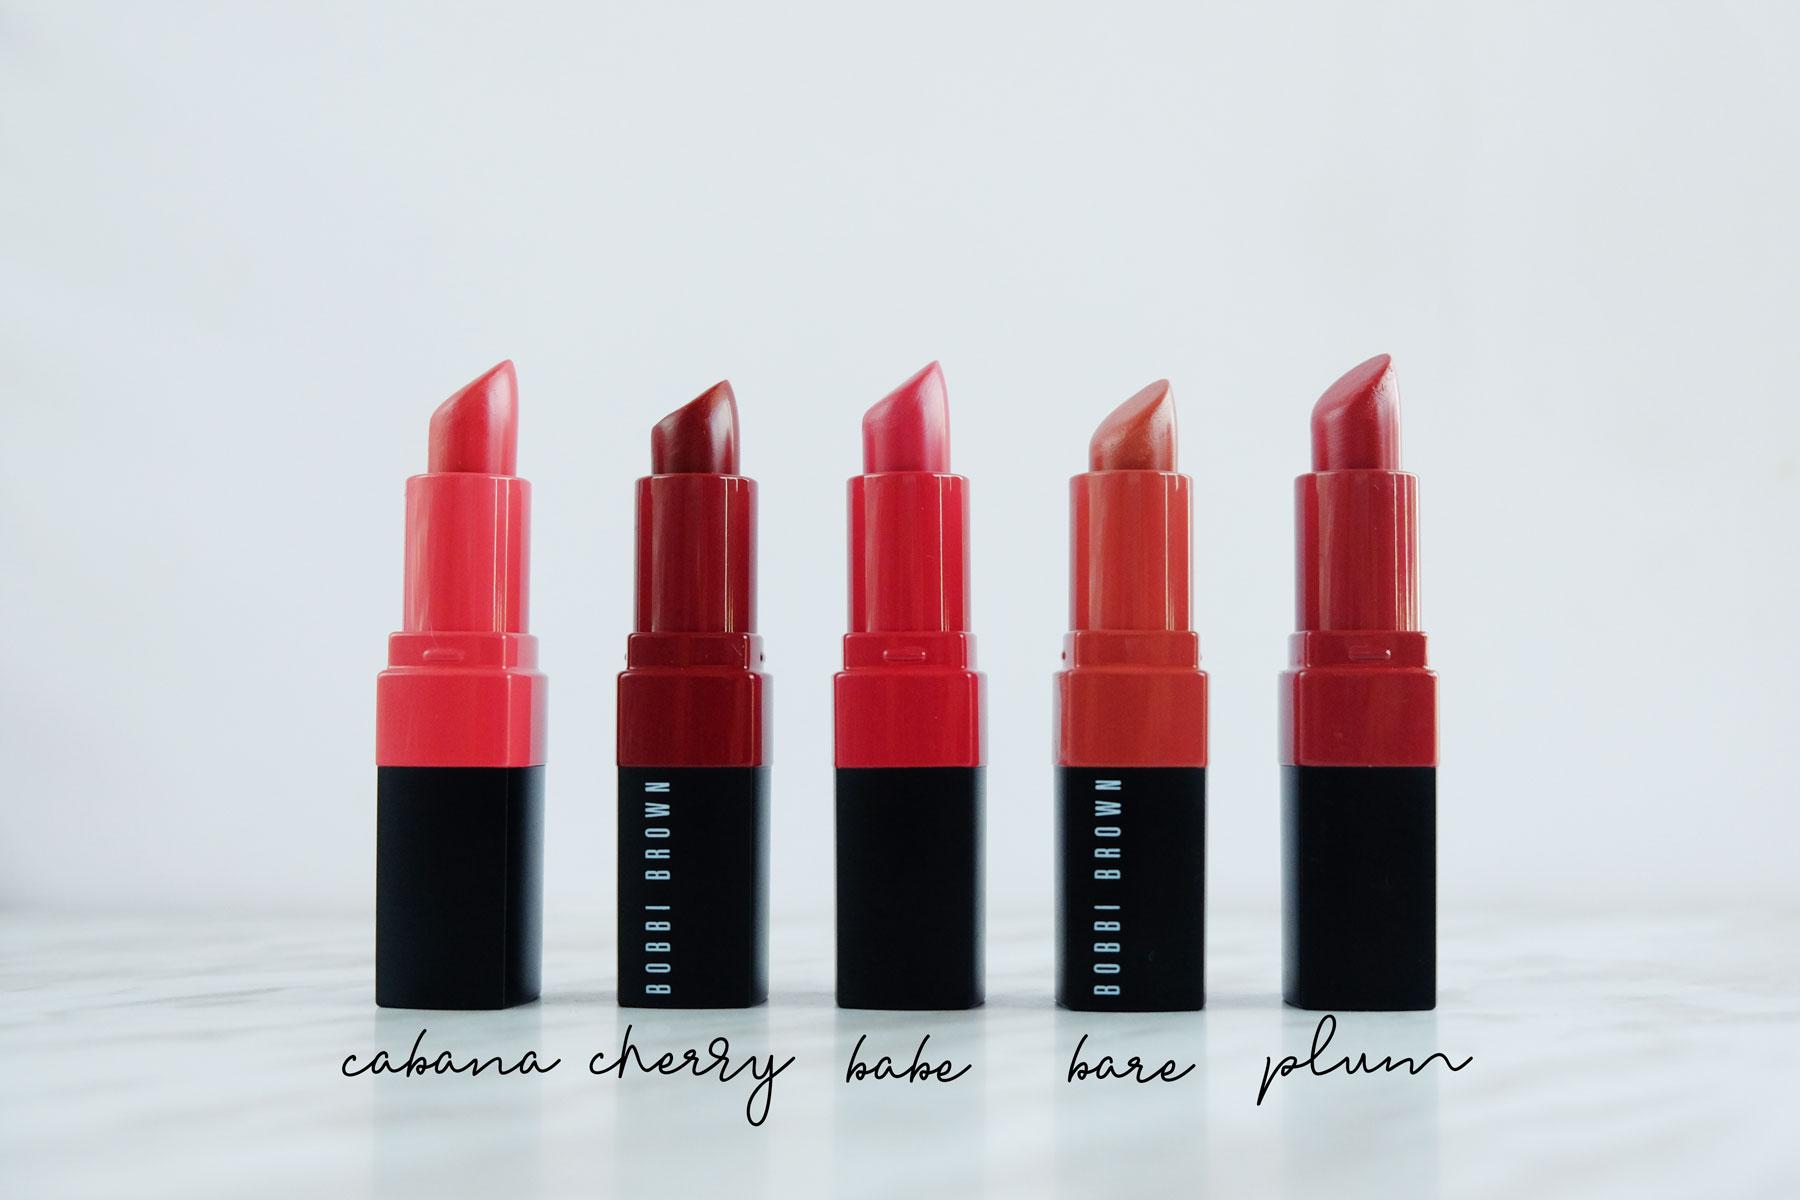 The perfect everyday wear lipsticks - the Bobbi Brown Crushed Lipsticks range. #bobbibrown #lipstick #makeup